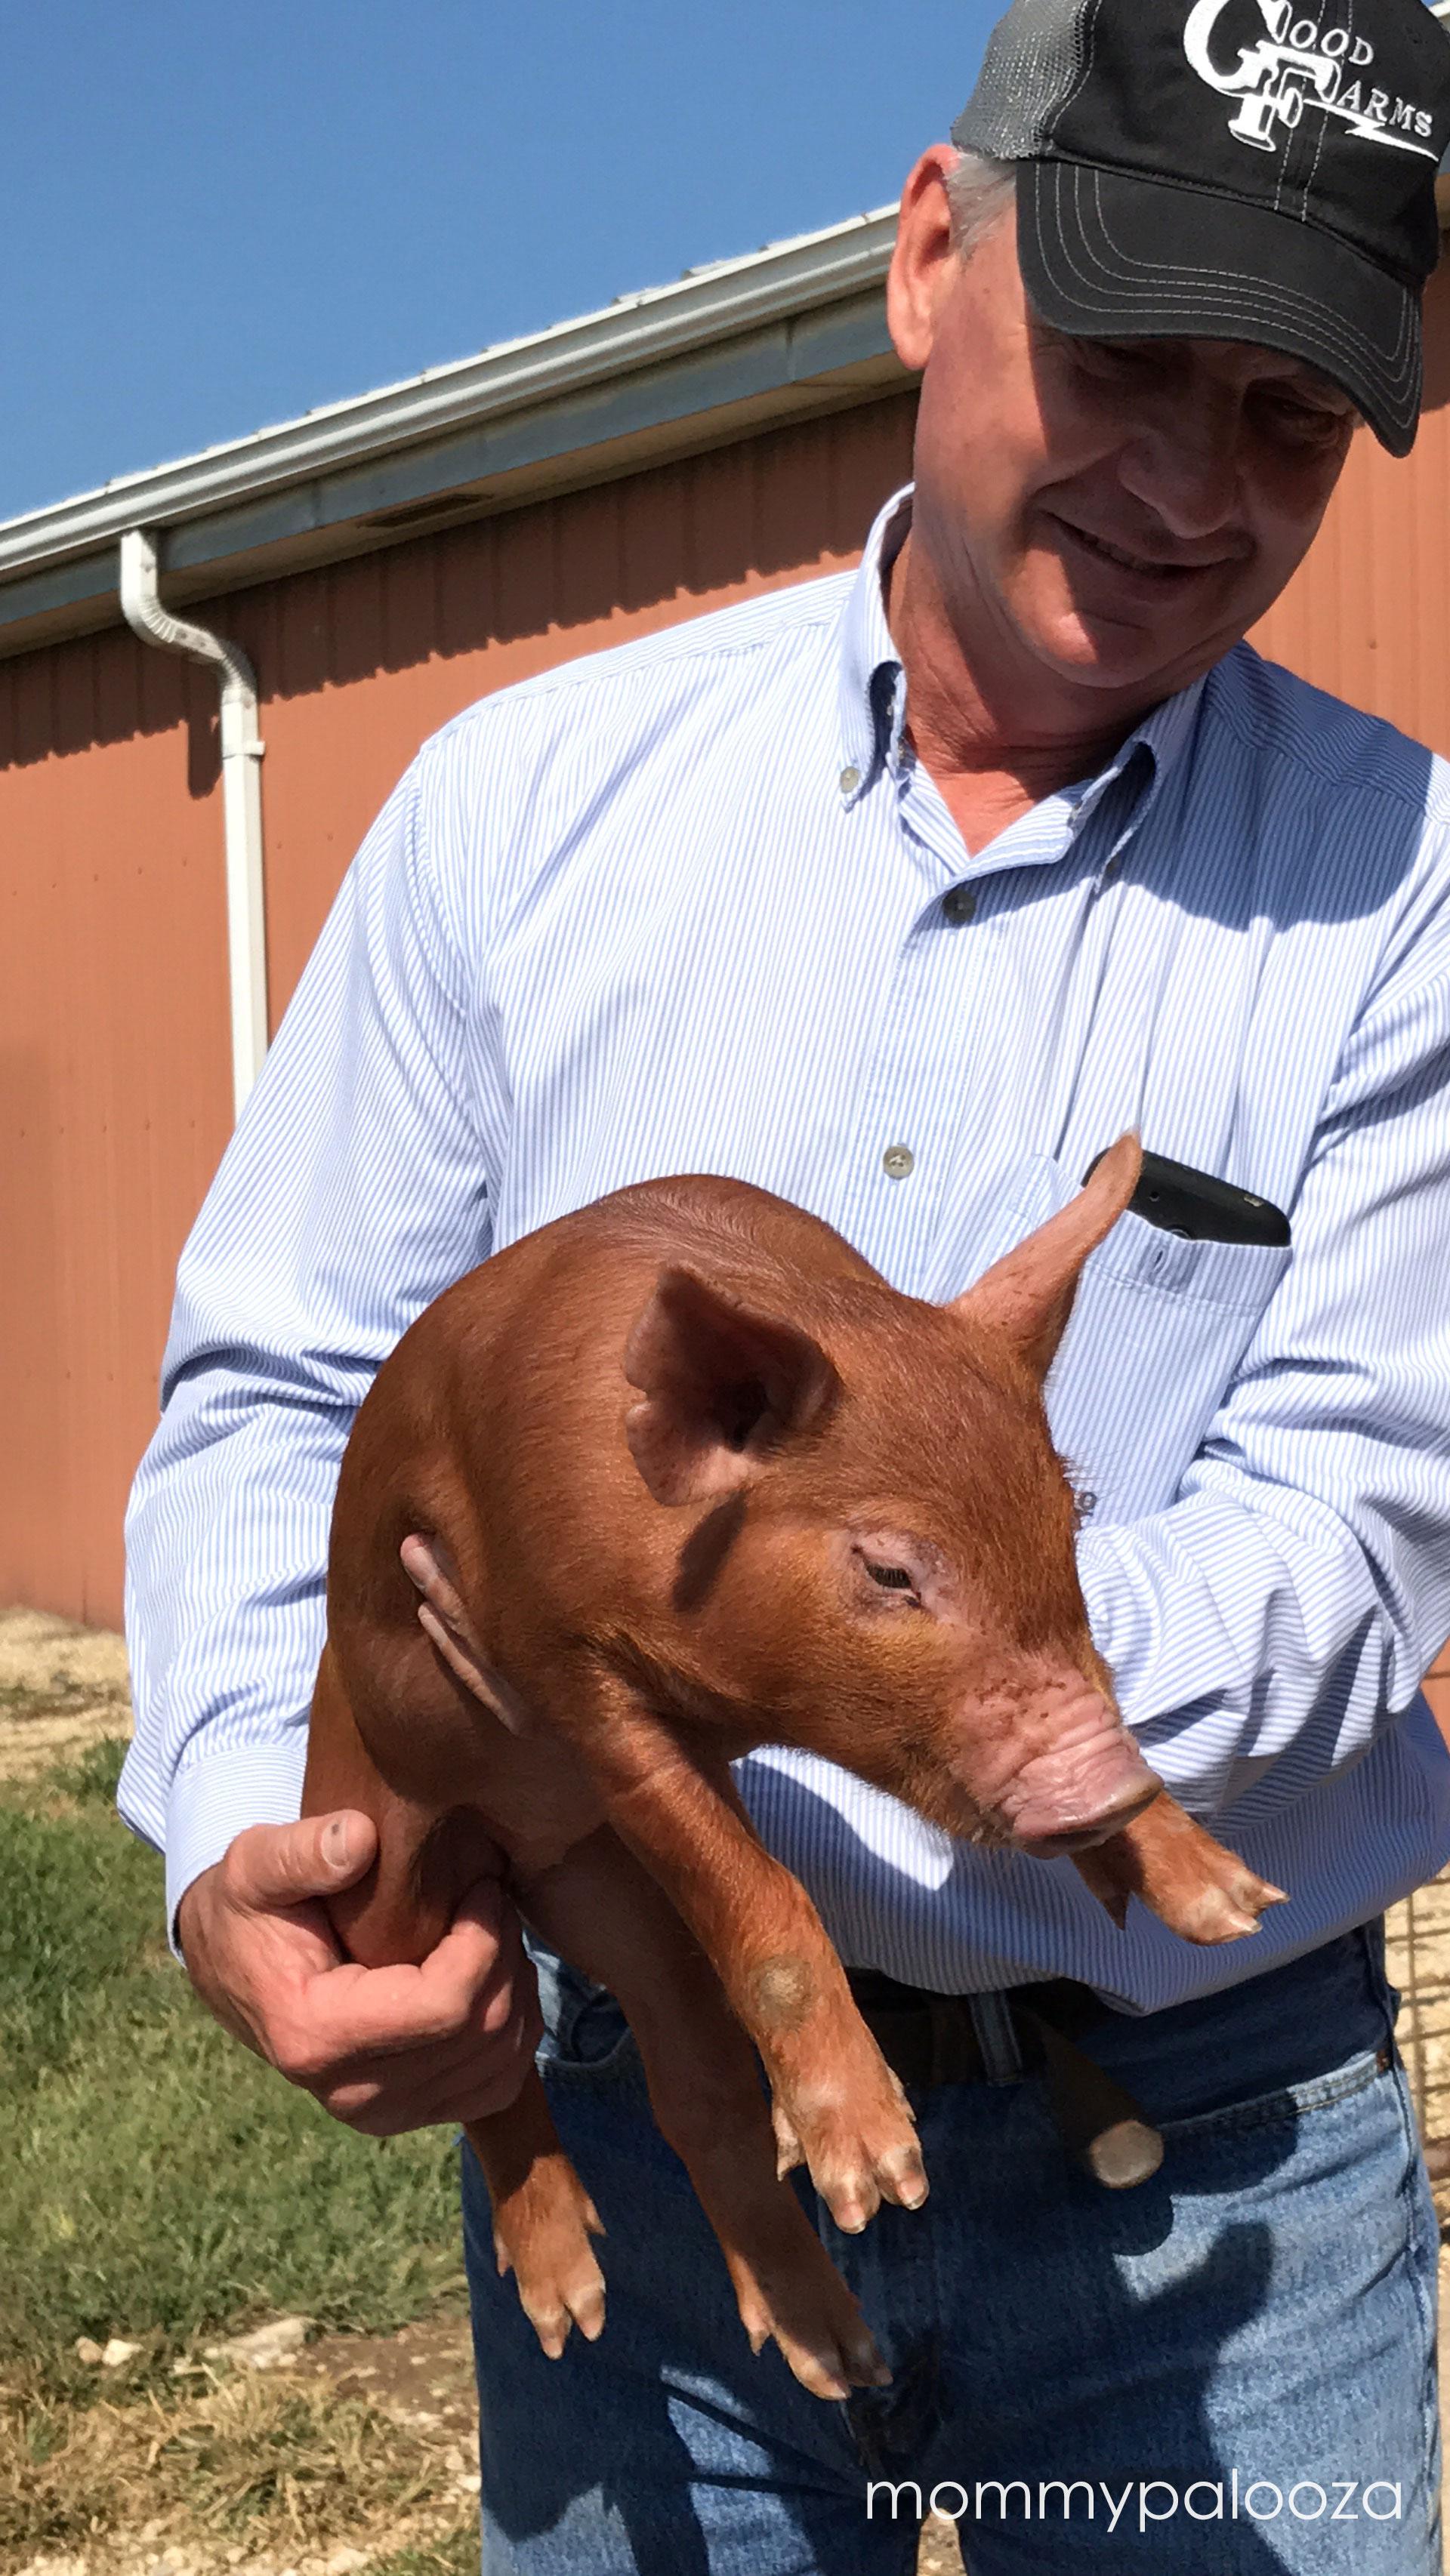 Good Pig Farm - Craig Good holding a baby pig